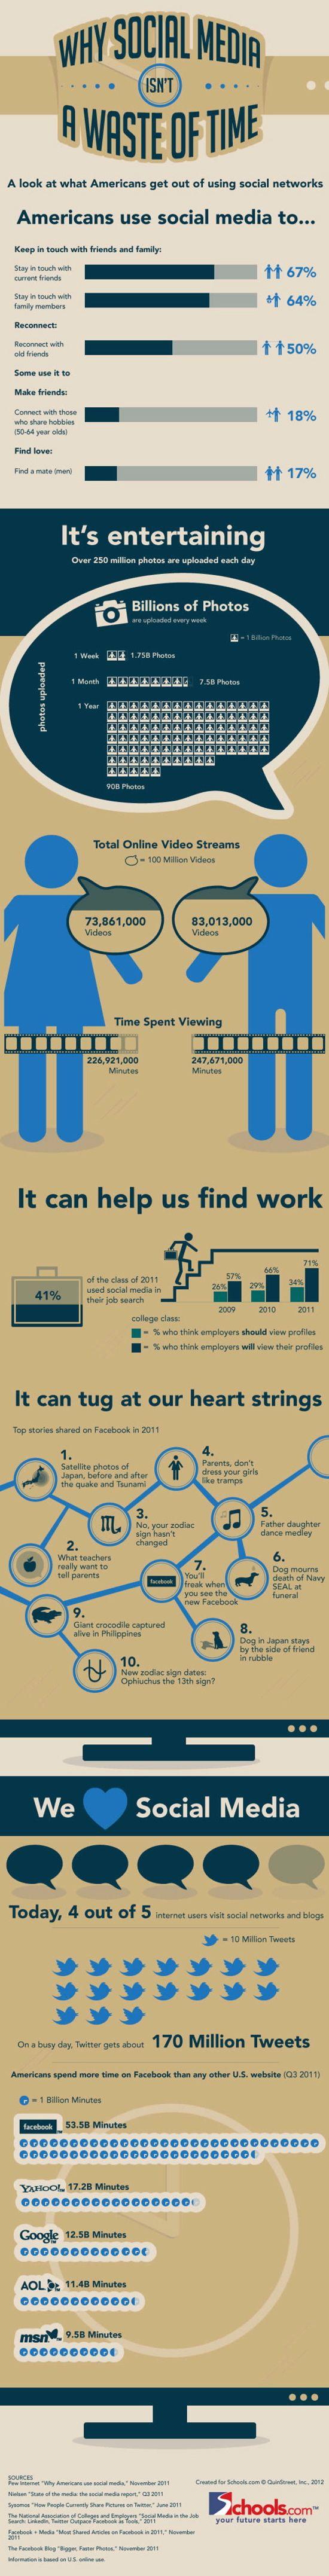 Why Social Media isn't a Waste of TimeSocial Network, Wasting Of Time, Time, Social Media, Media Marketing, Media Infographic, Pérdida De, Time Infographic, Socialmedia